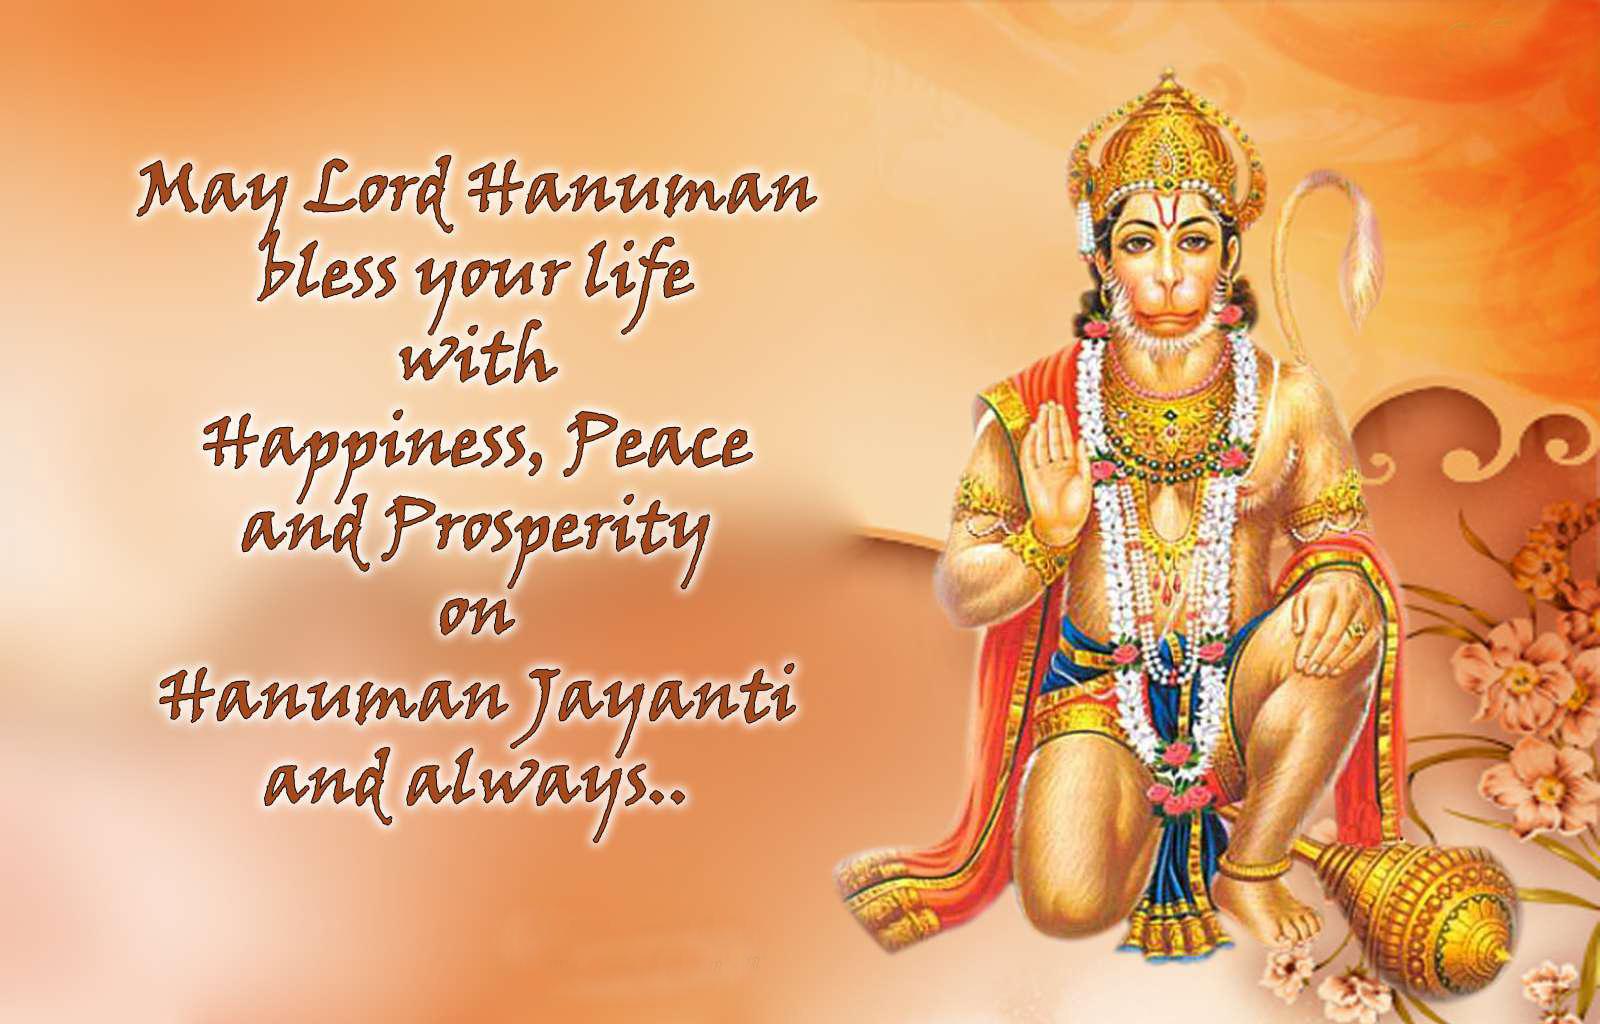 Panchmukhi Ganesh Wallpaper Hd Bhagwan Ji Help Me Hanuman Jayanti Wishesh Wallpaper